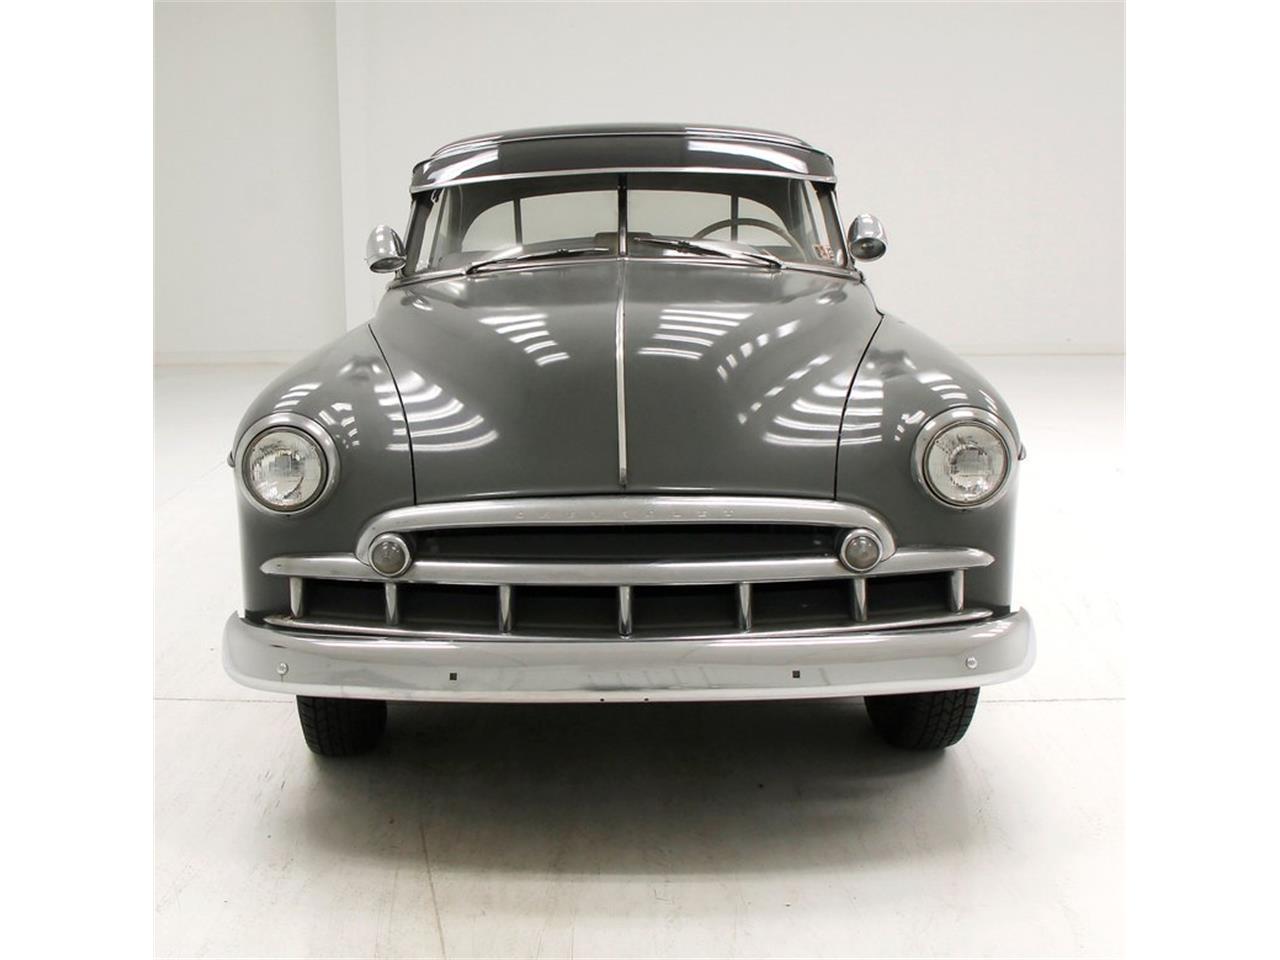 1950 Chevrolet Styleline (CC-1385173) for sale in Morgantown, Pennsylvania